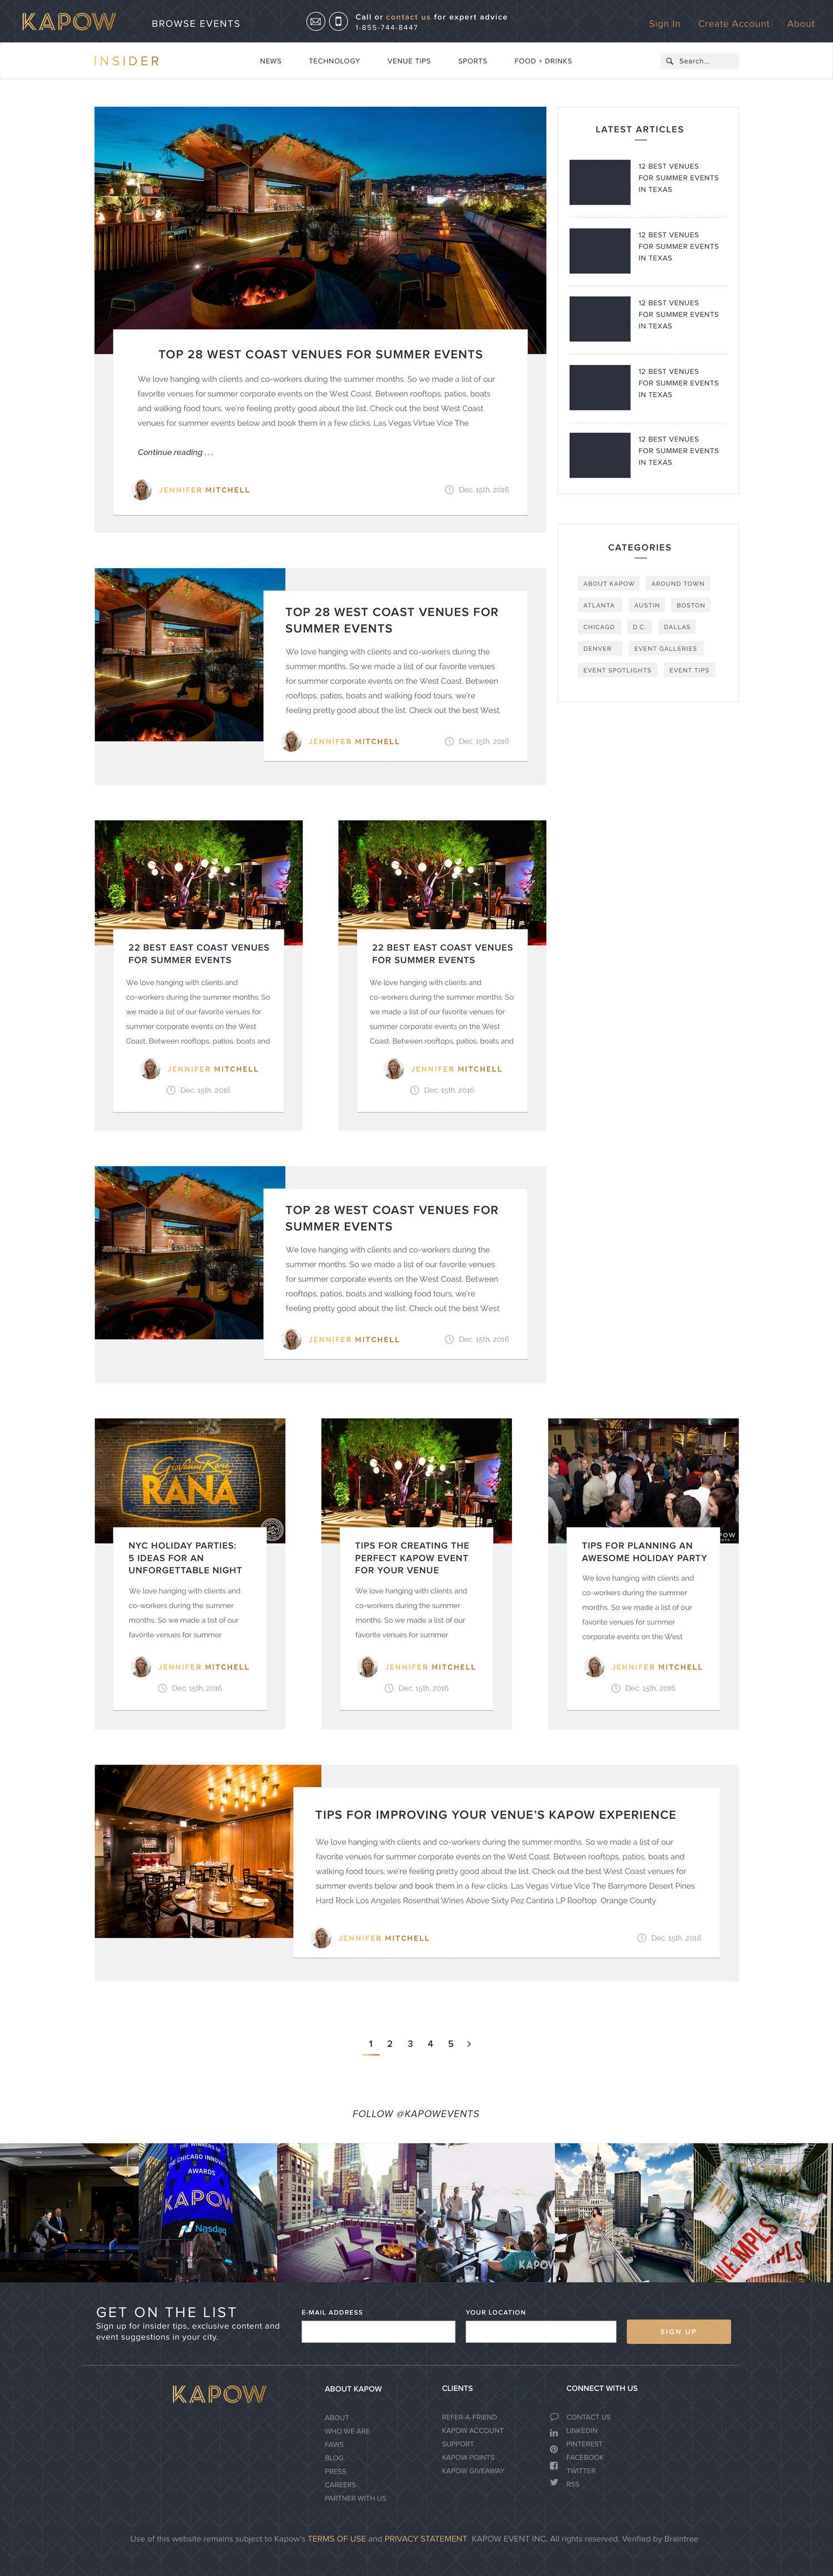 Web Design | Kapow Blog